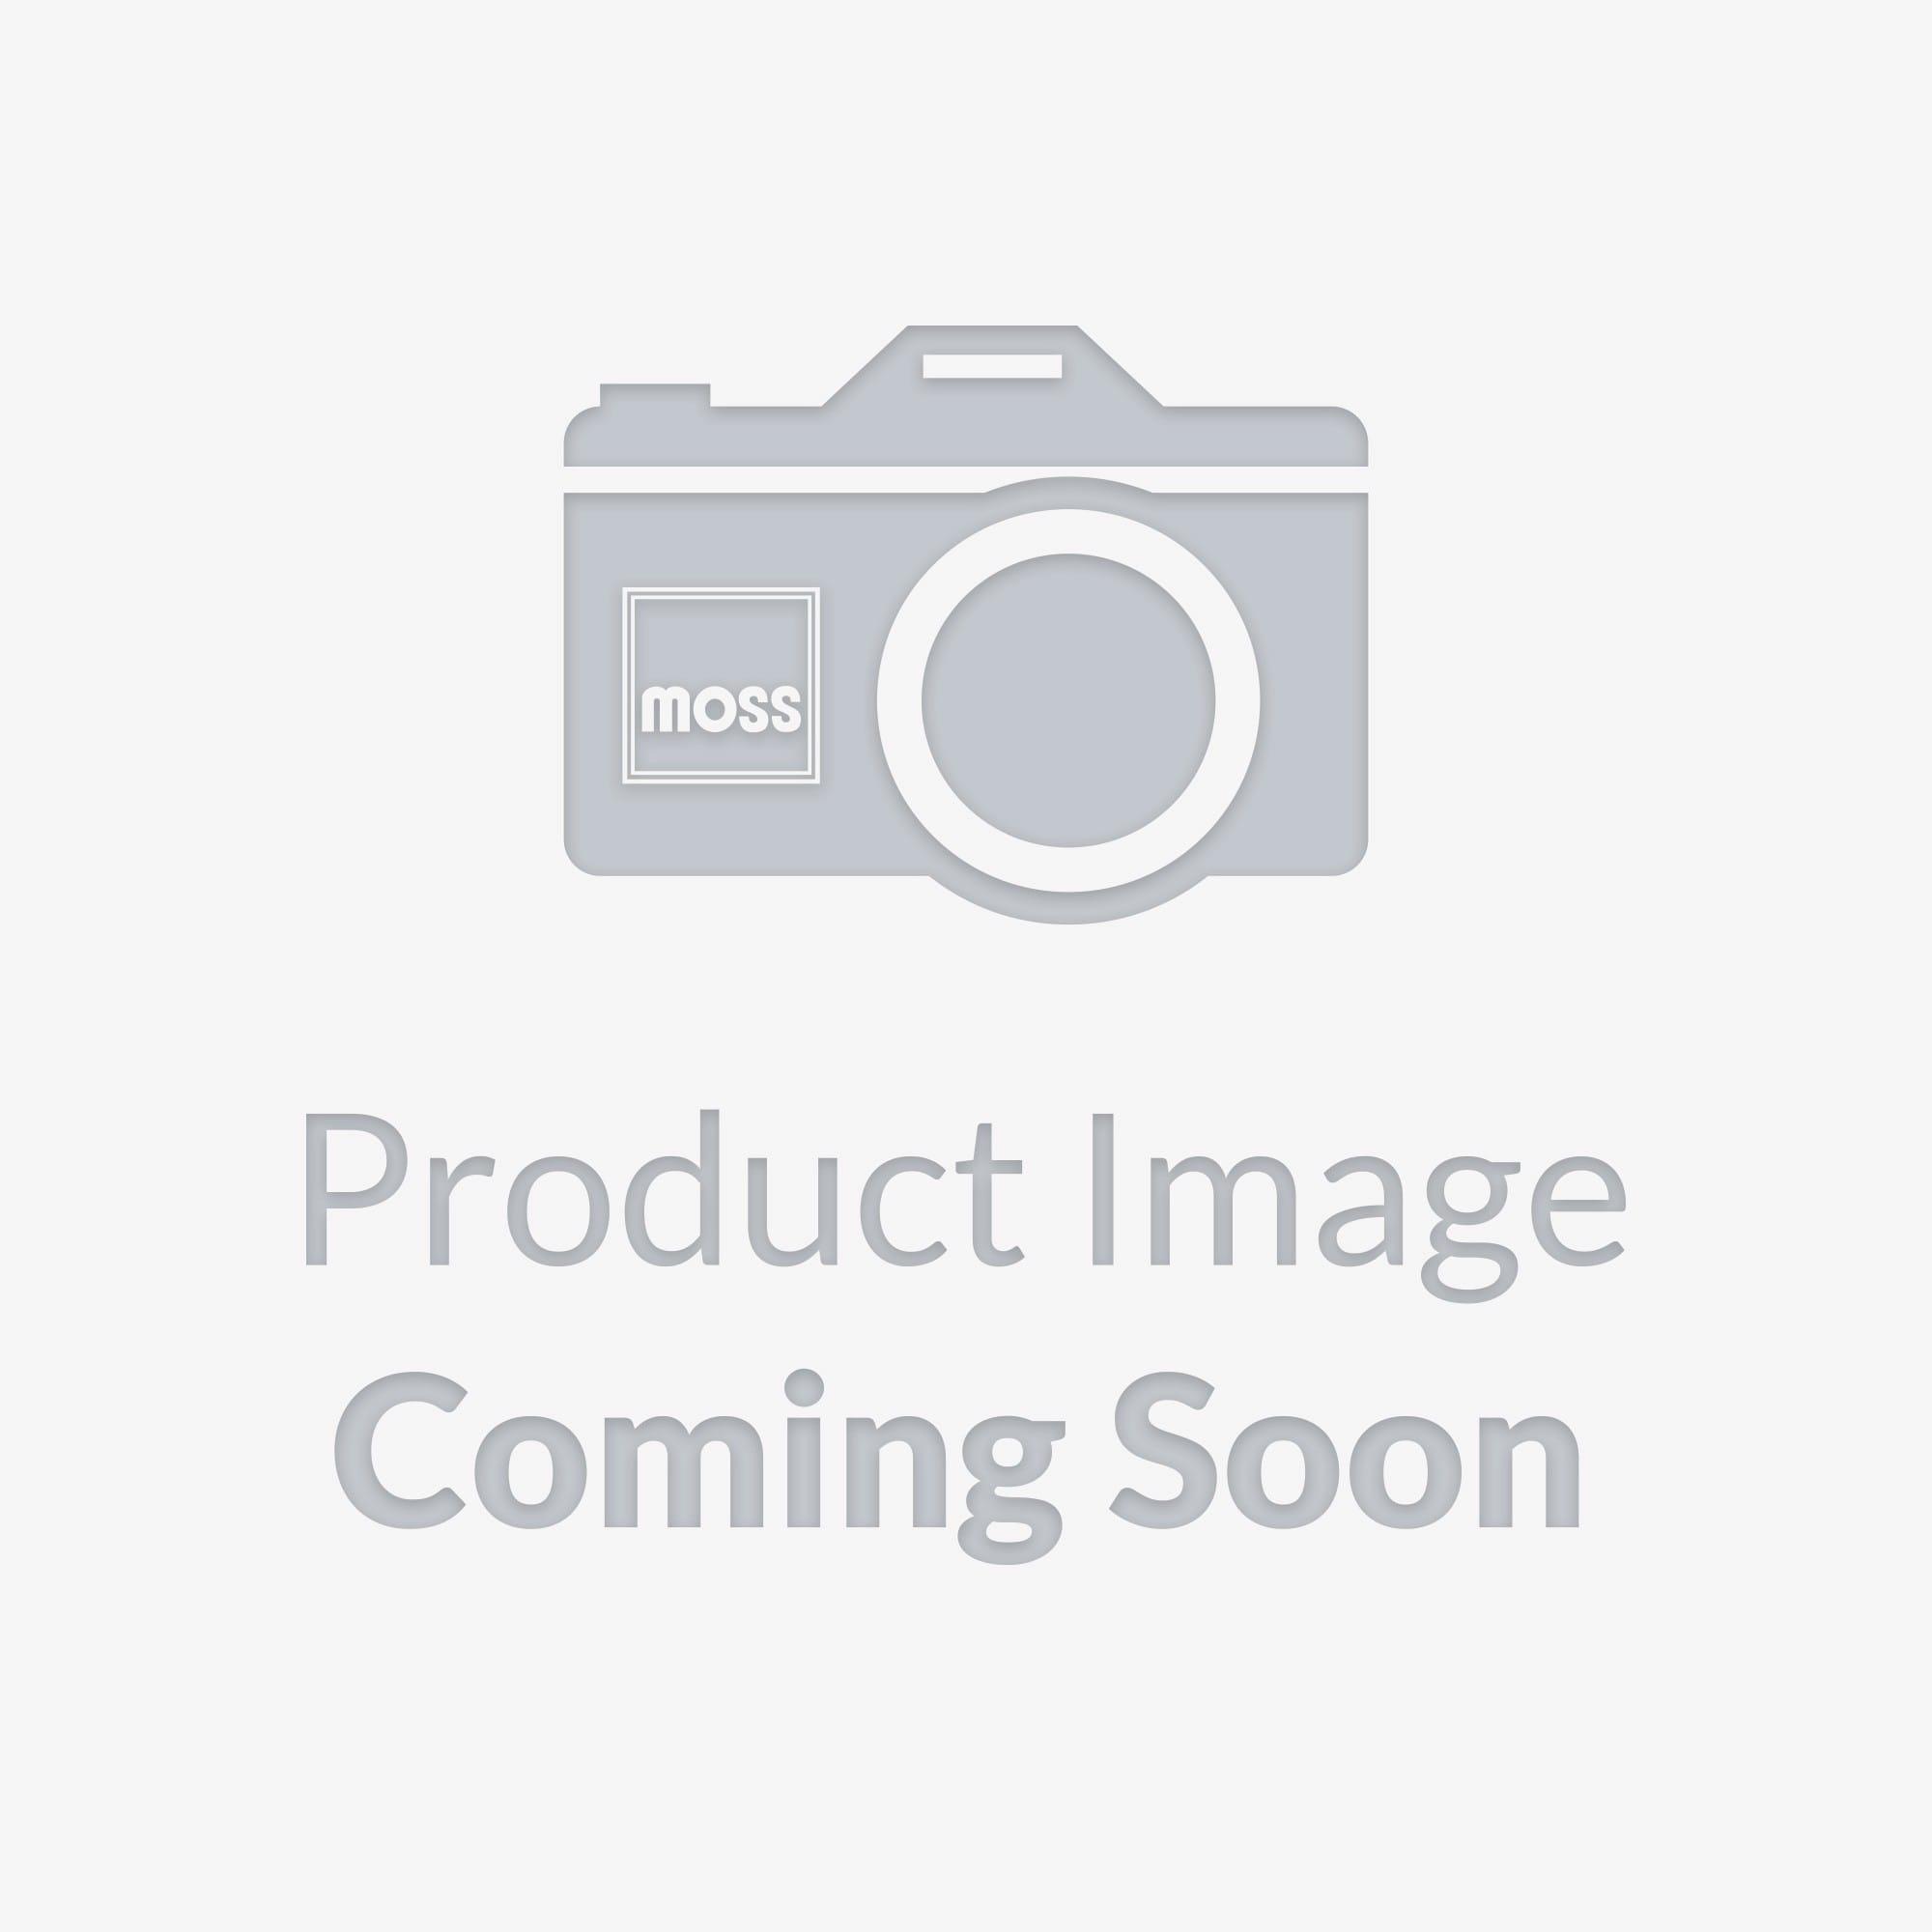 211 430 book haynes carburetor manual su zenith stromberg weber rh mossmotors com su carb workshop manual pdf su carburettor workshop manual pdf